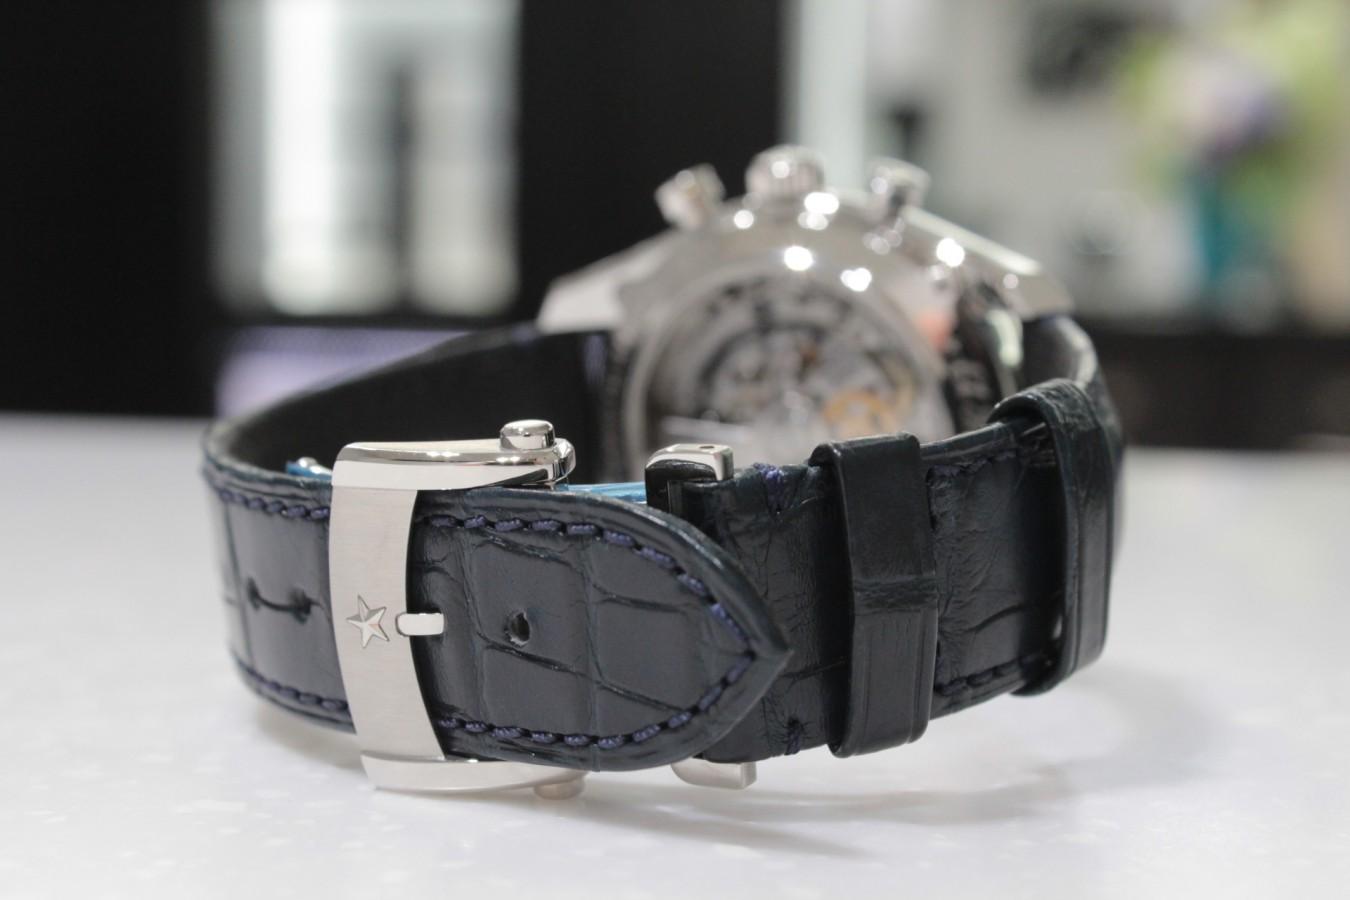 IMG_4277 高級感の漂うブルー文字盤が綺麗な「エル・プリメロ オープン」 - CHRONOMASTER